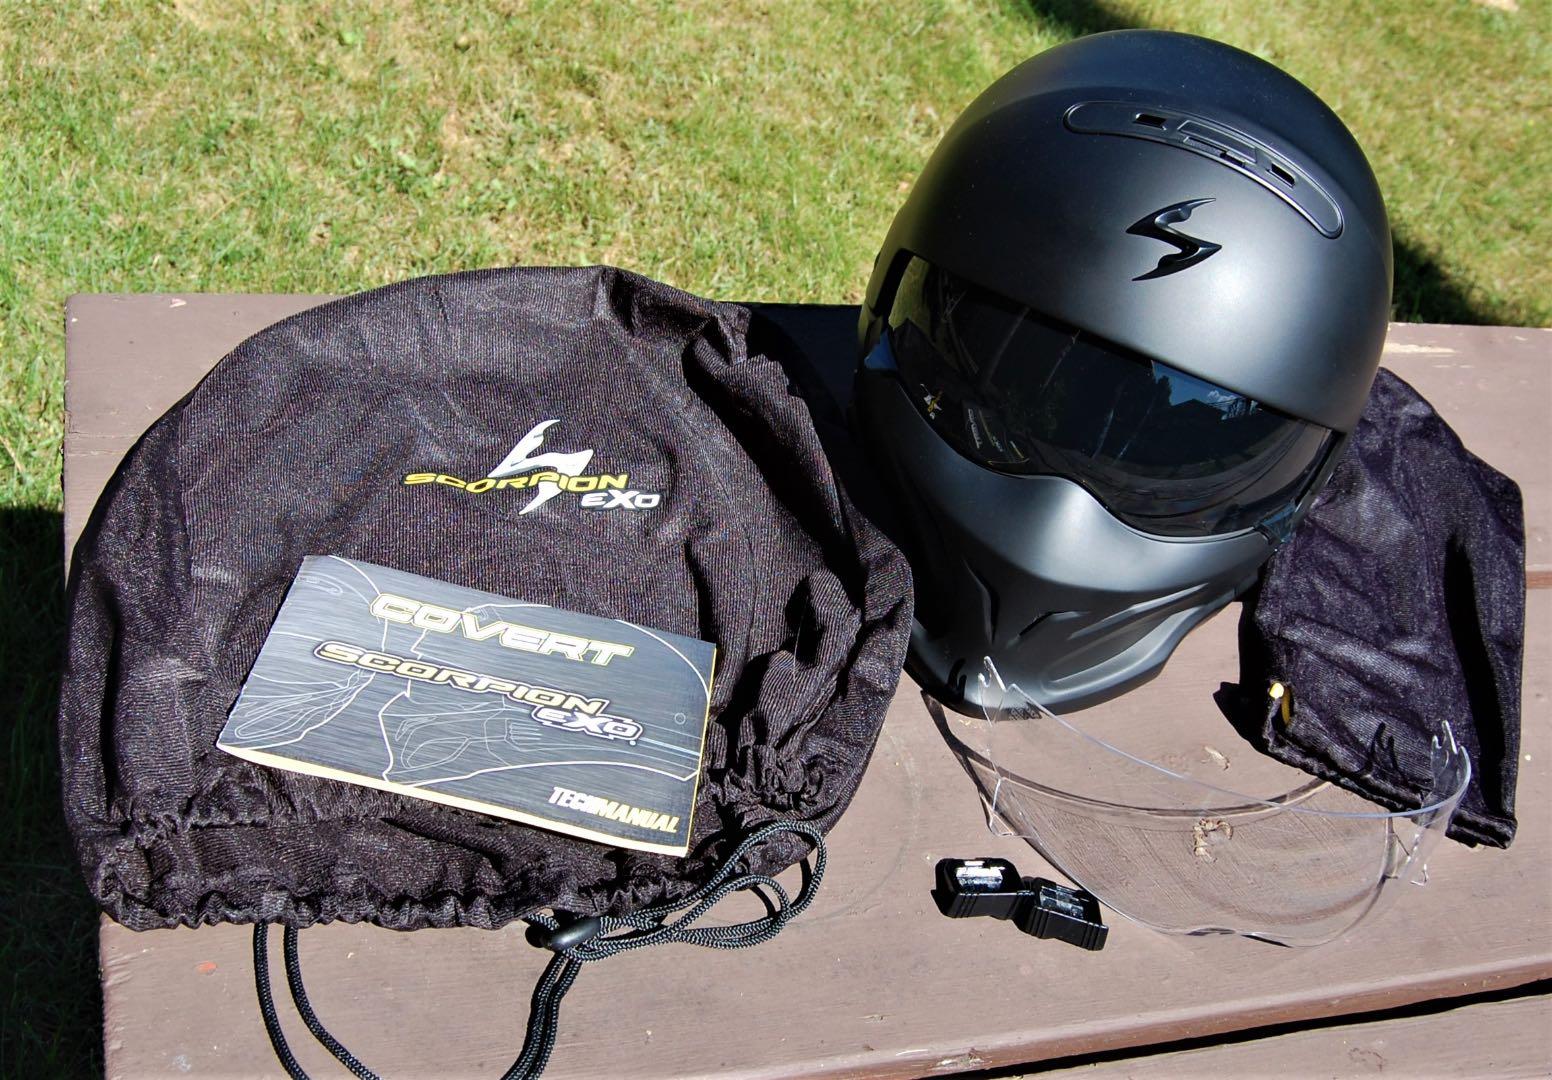 Scorpion Covert 3-in-1 Helmet test